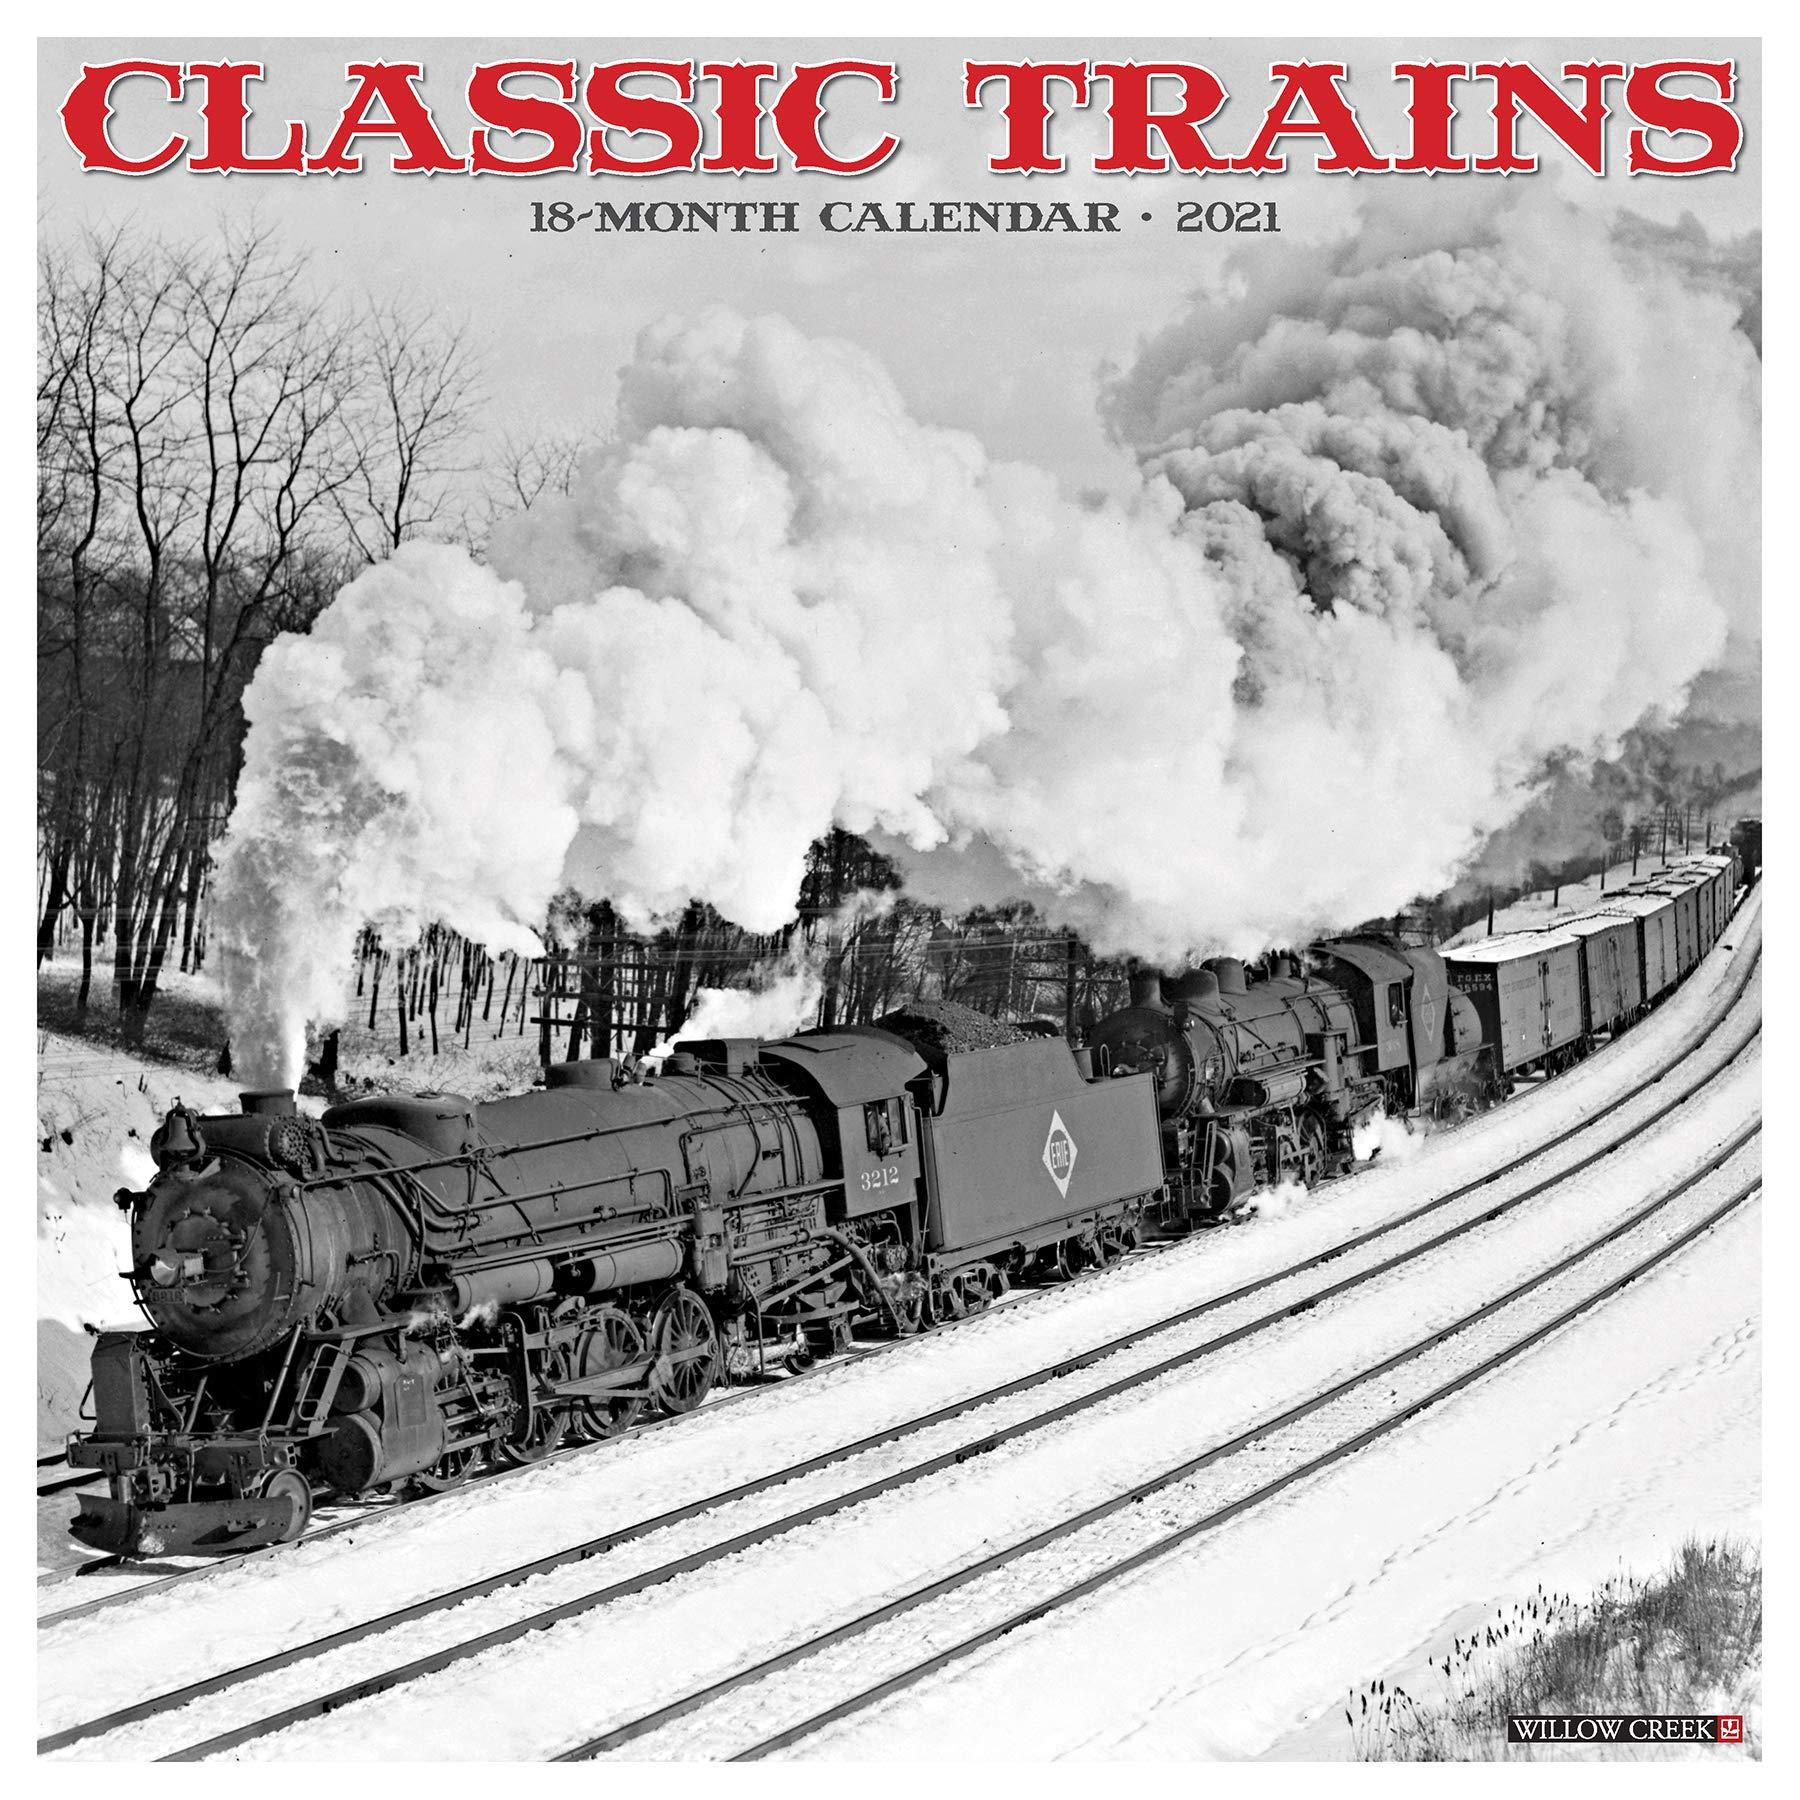 Train Calendar 2021 Images